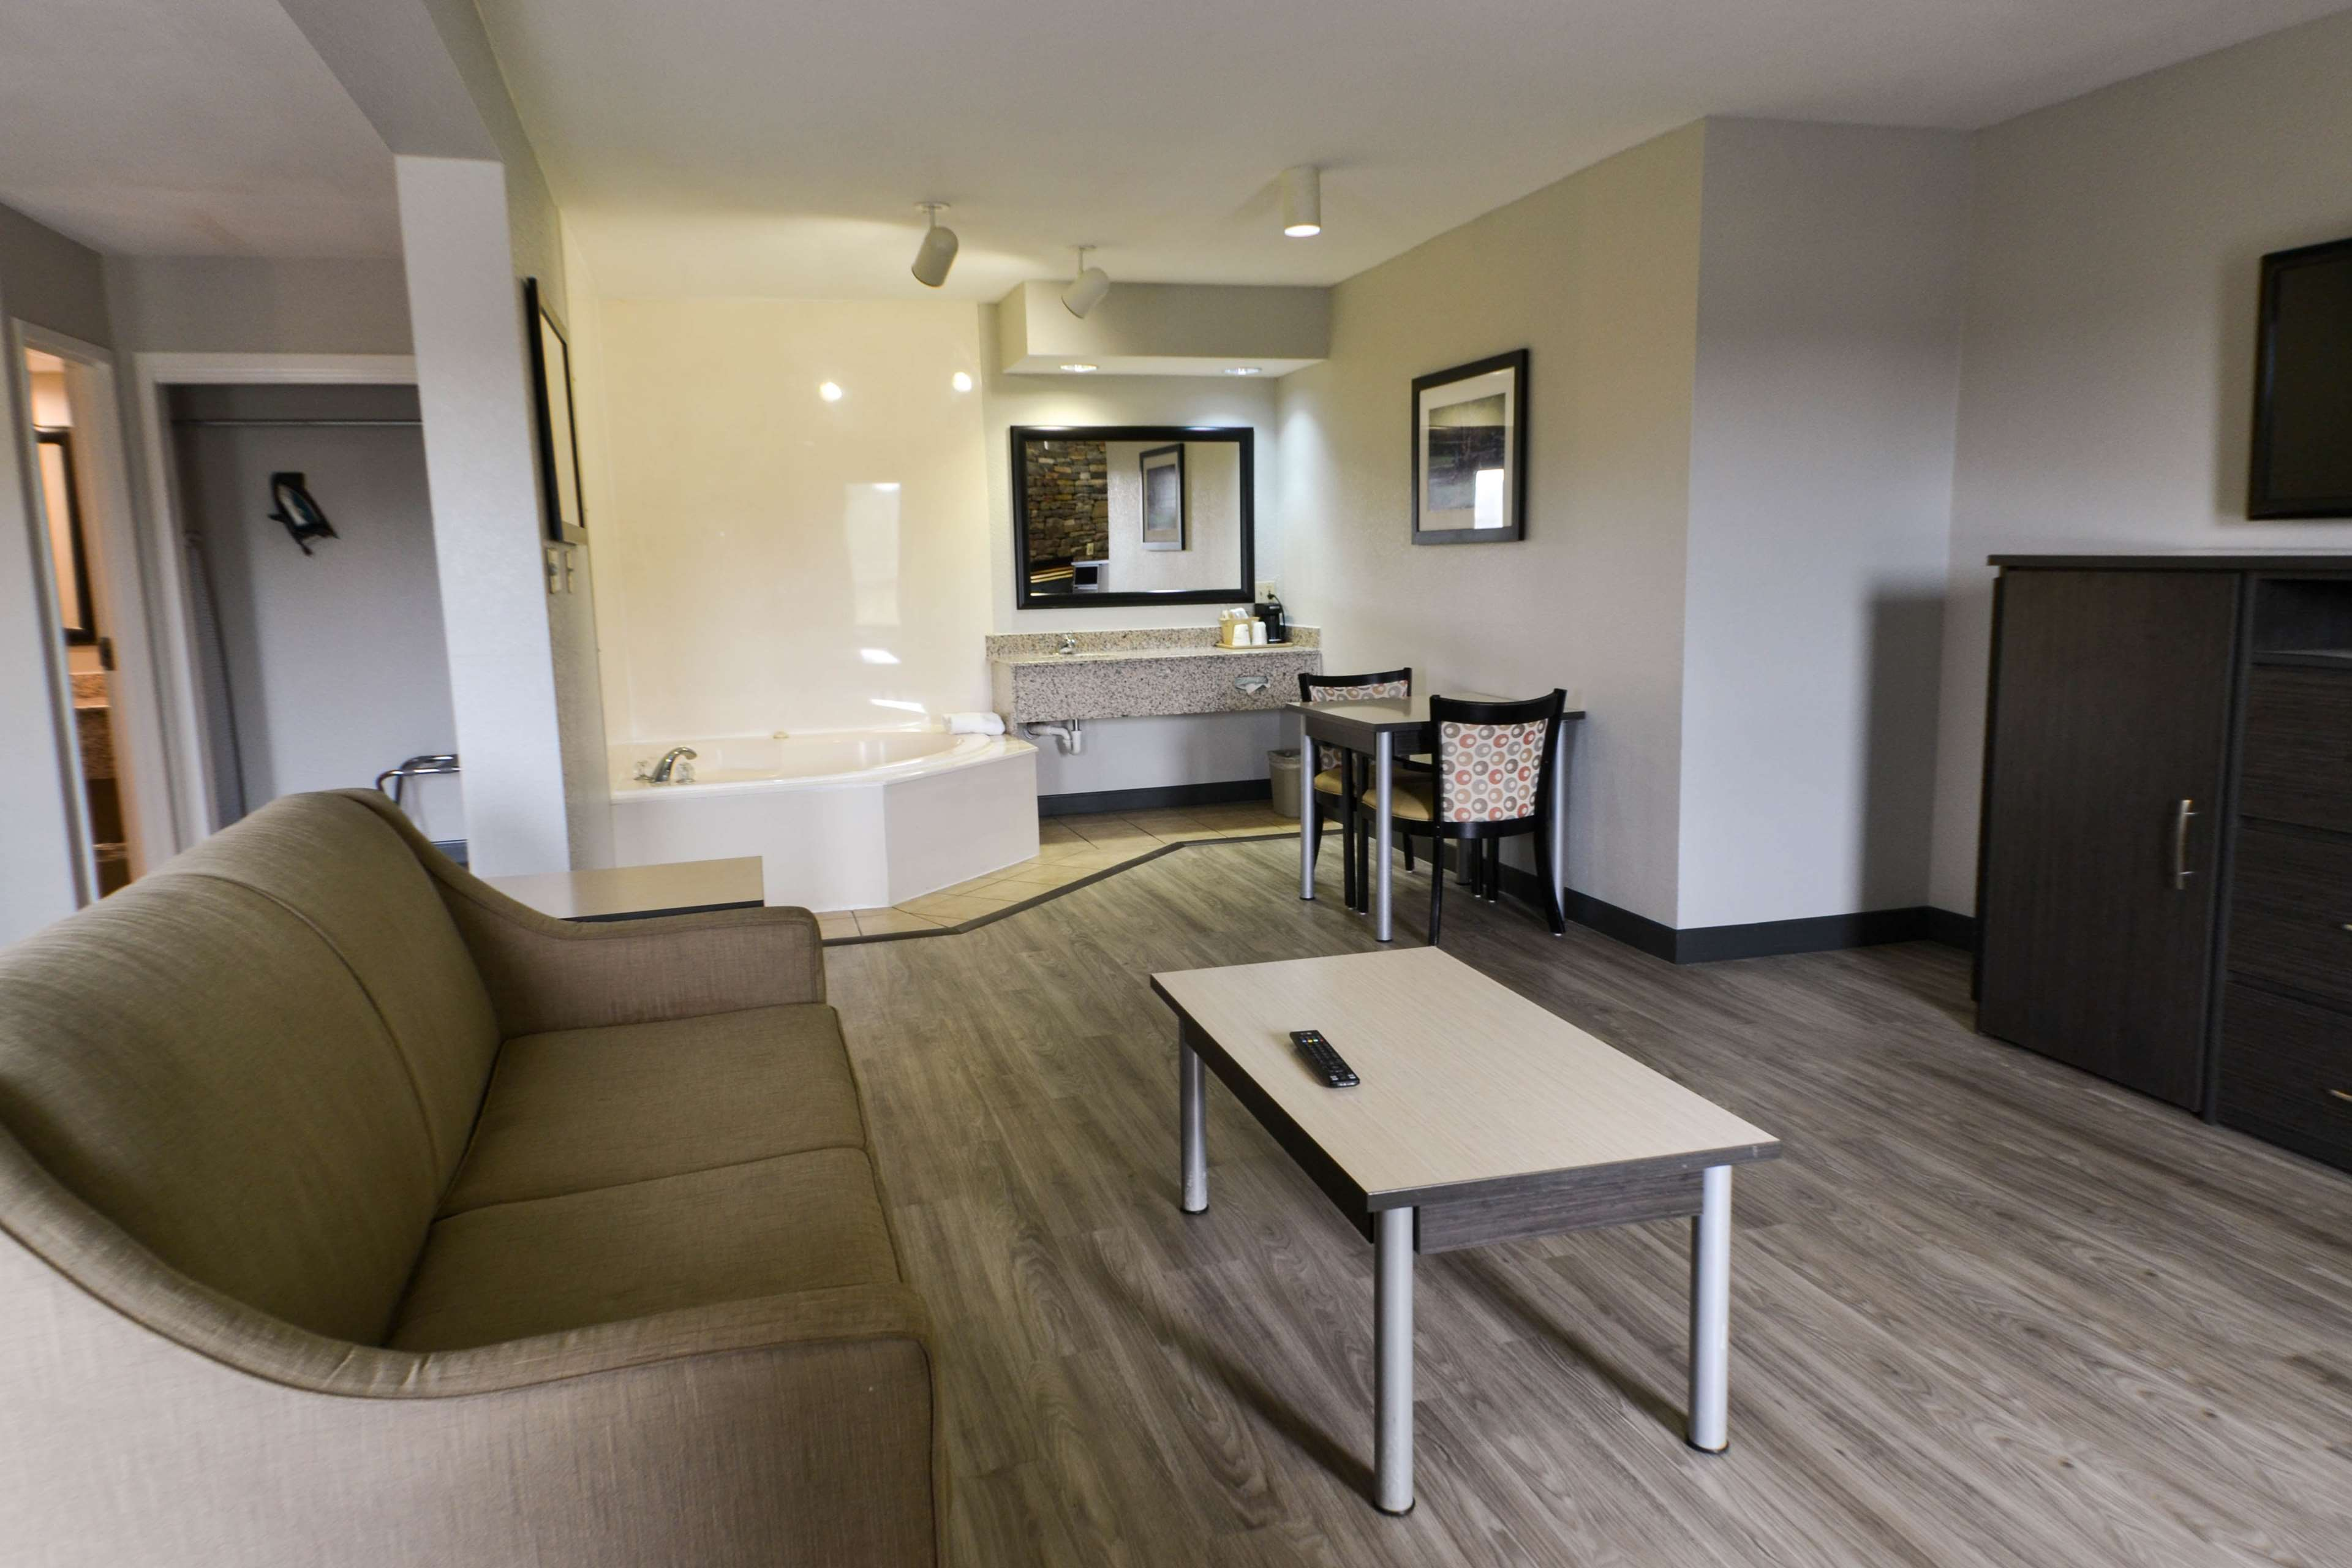 Best Western Cades Cove Inn image 25